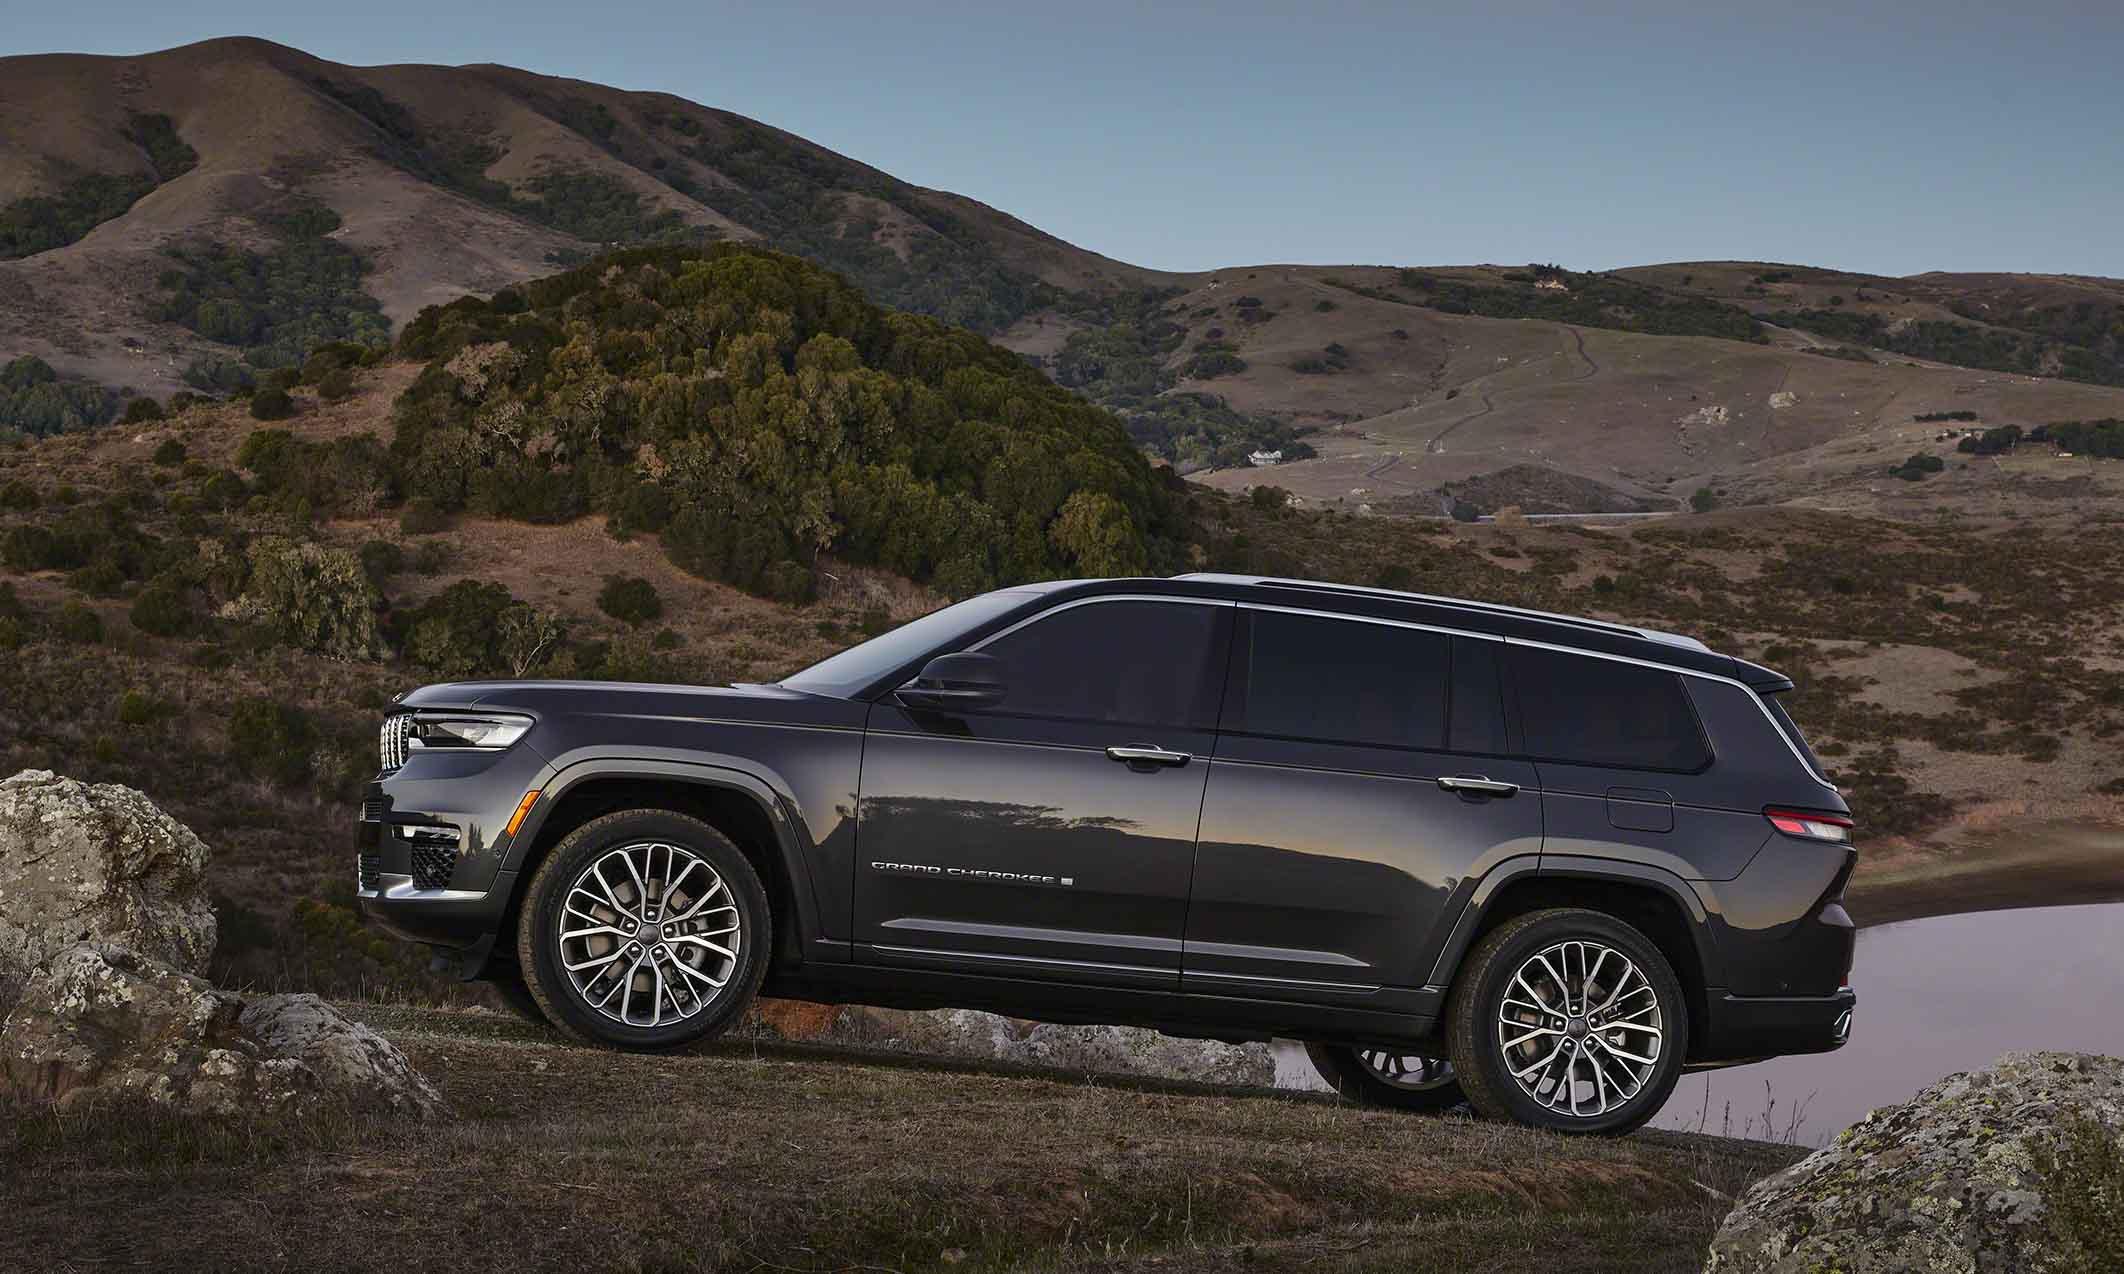 2021 Jeep Grand Cherokee L: First Look - » AutoNXT